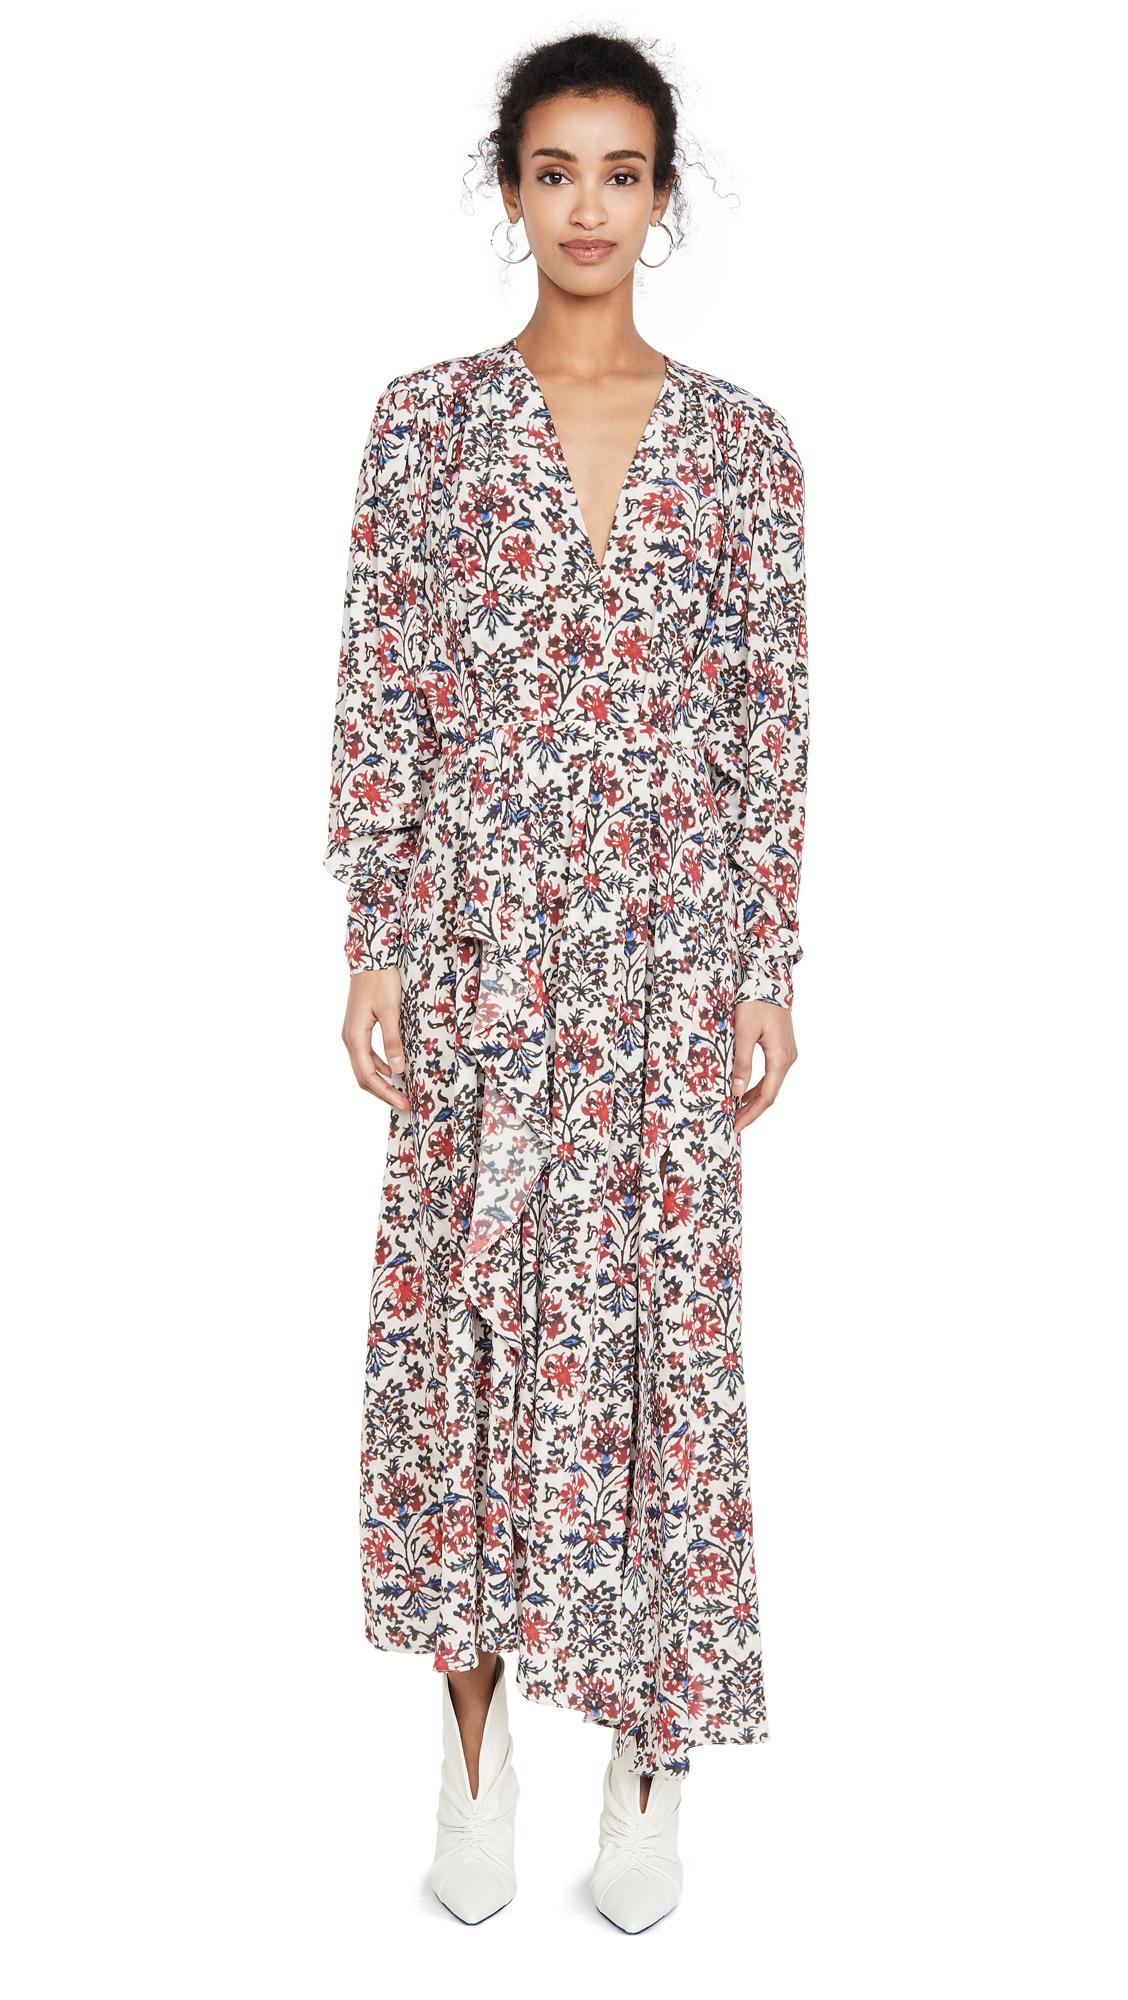 Isabel Marant Blaine Dress - 50% Off Sale